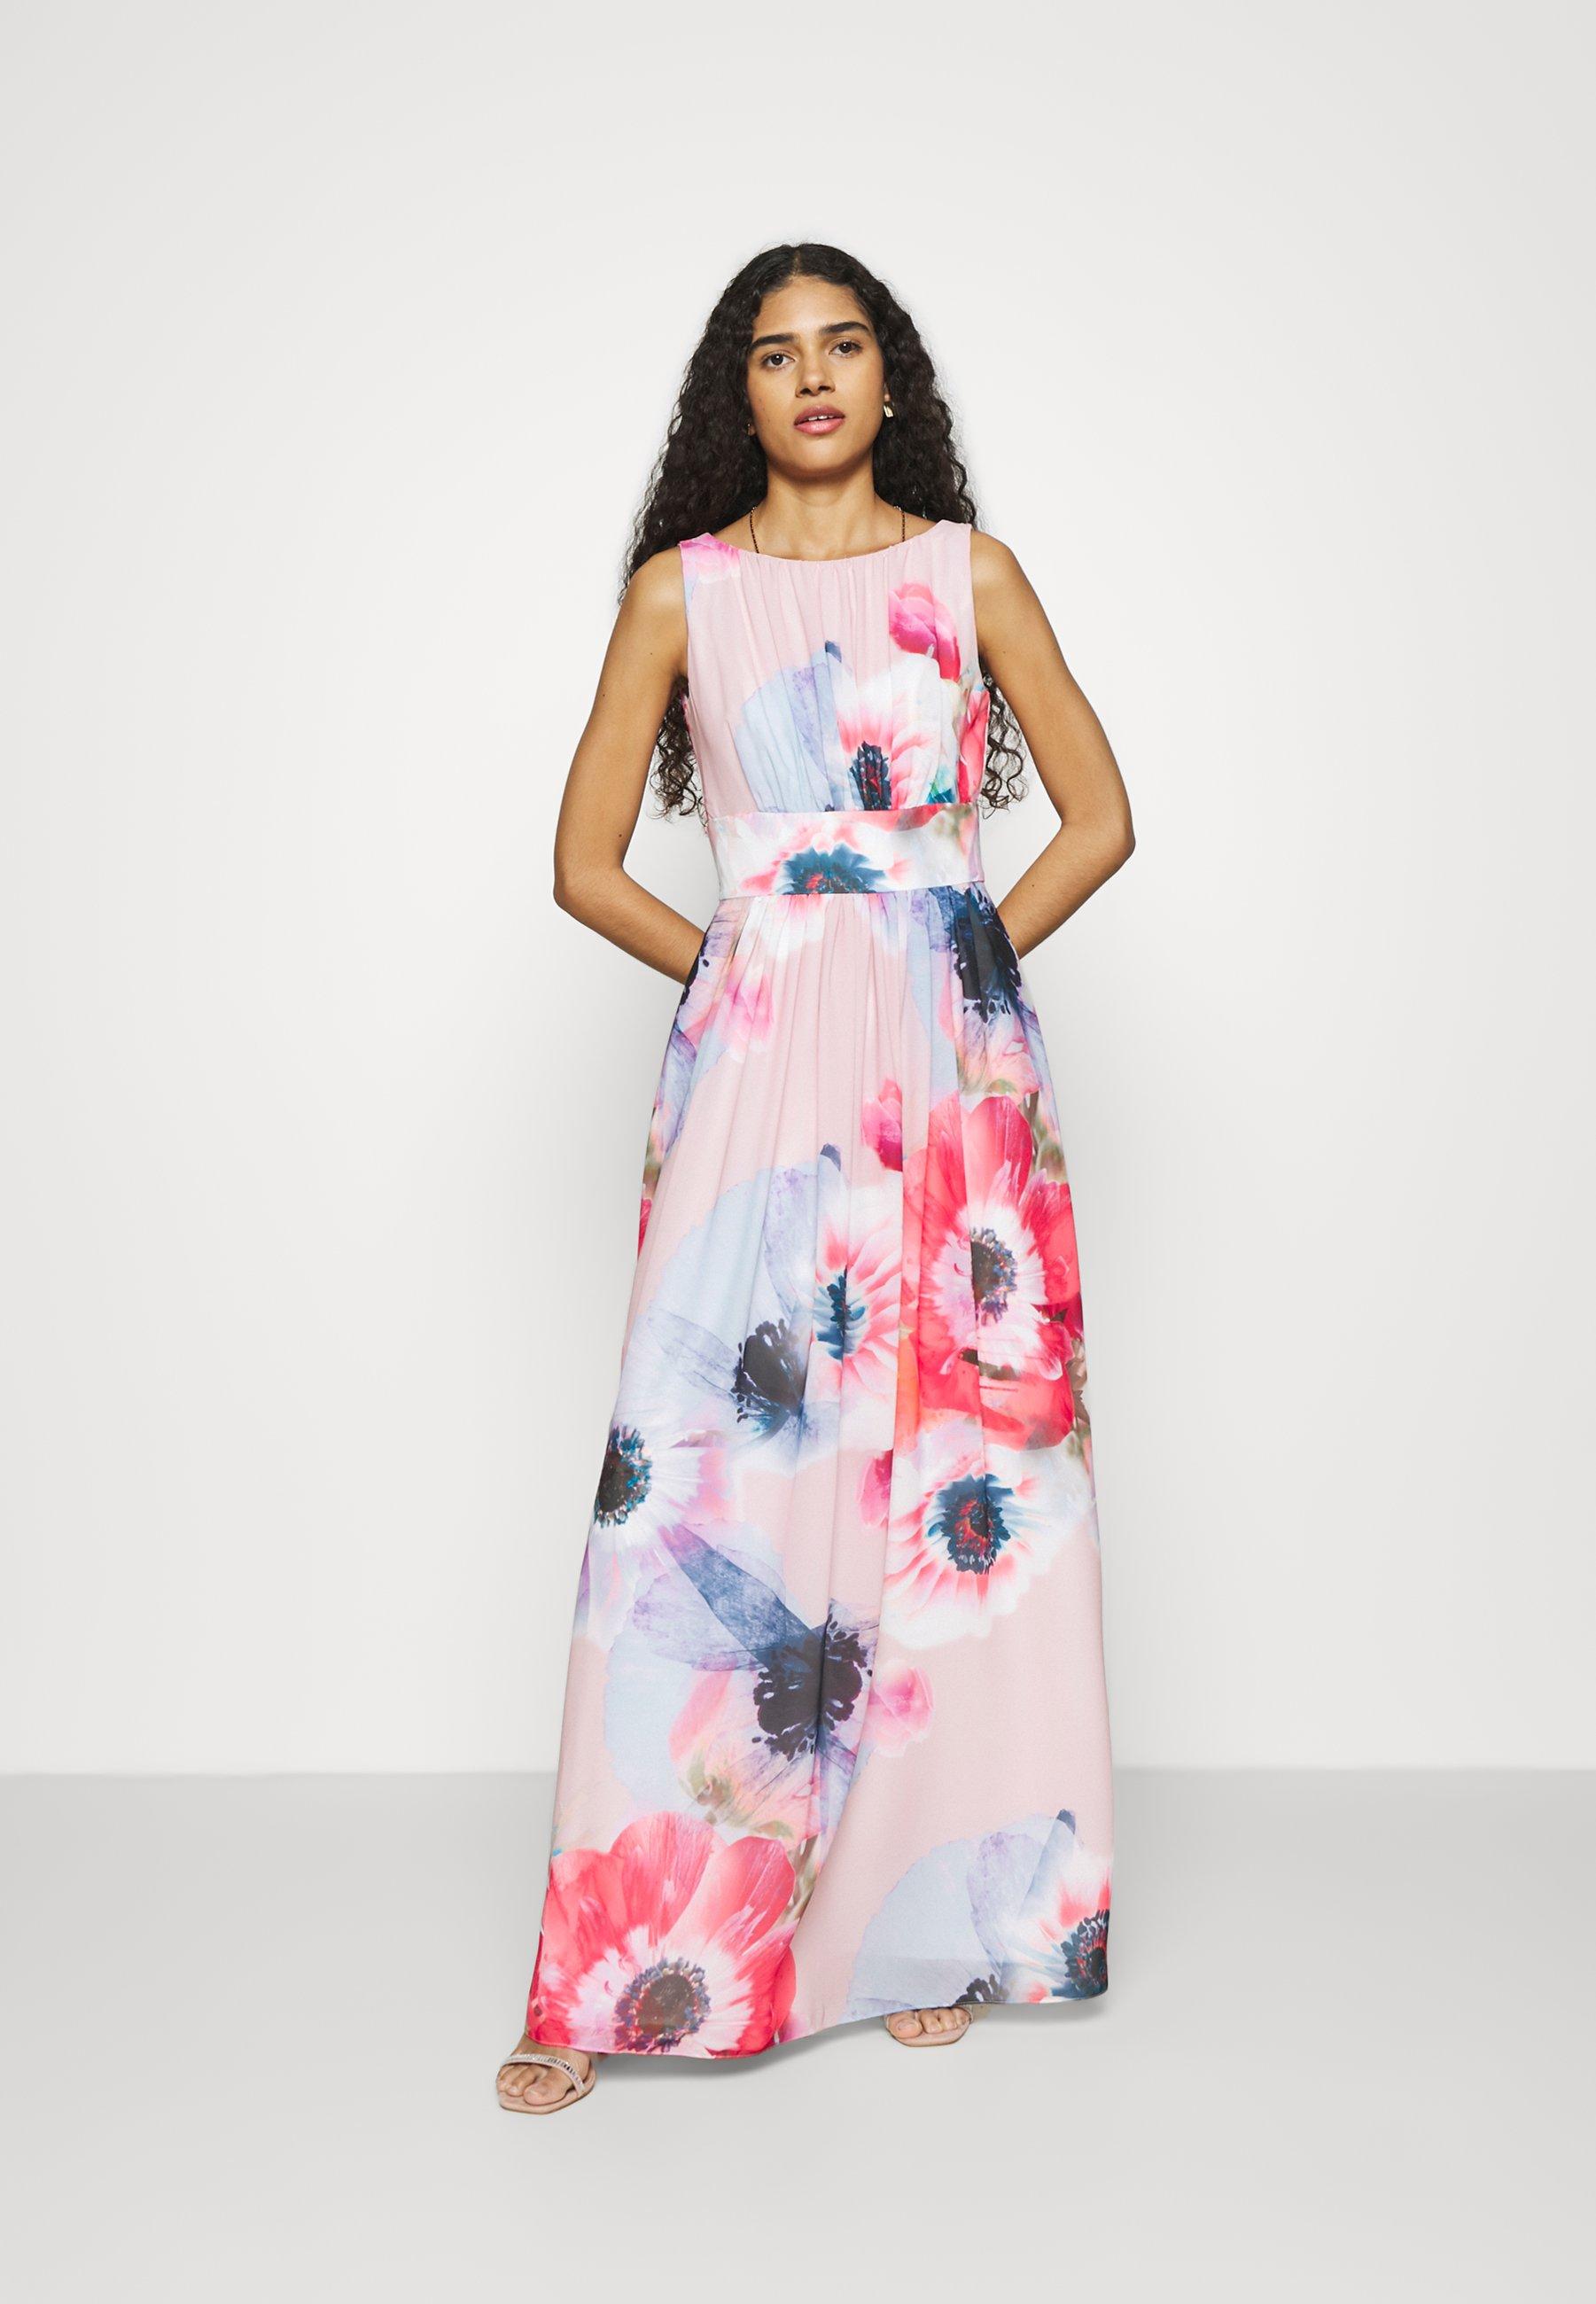 Swing Abendkleid Maxikleid Powder Pink Multi Mehrfarbig Zalando De